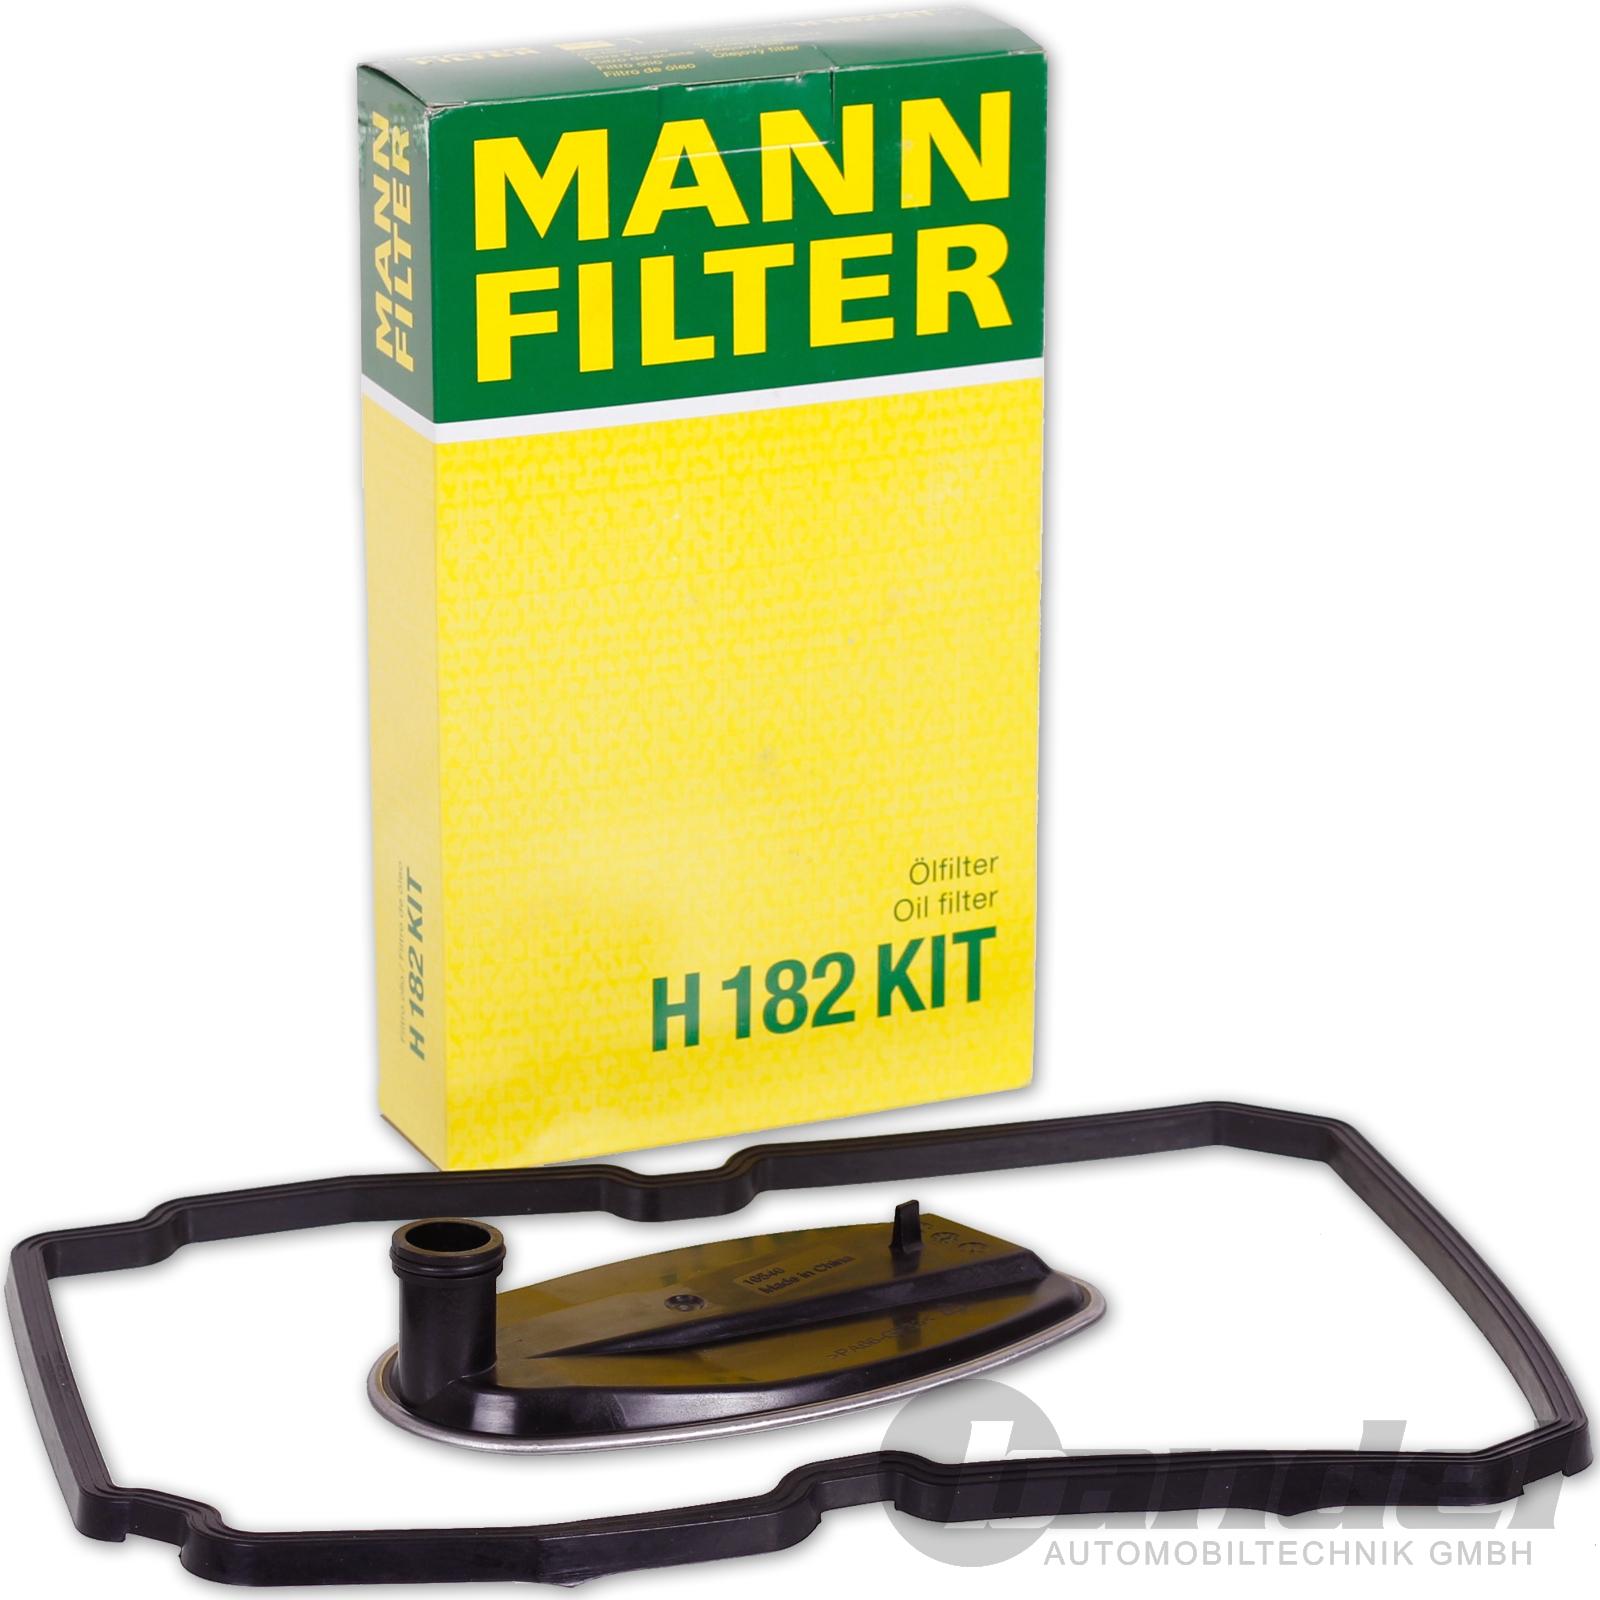 MANN-FILTER HYDRAULIKFILTER SATZ AUTOMATIK-GETRIEBE MERCEDES VITO W639